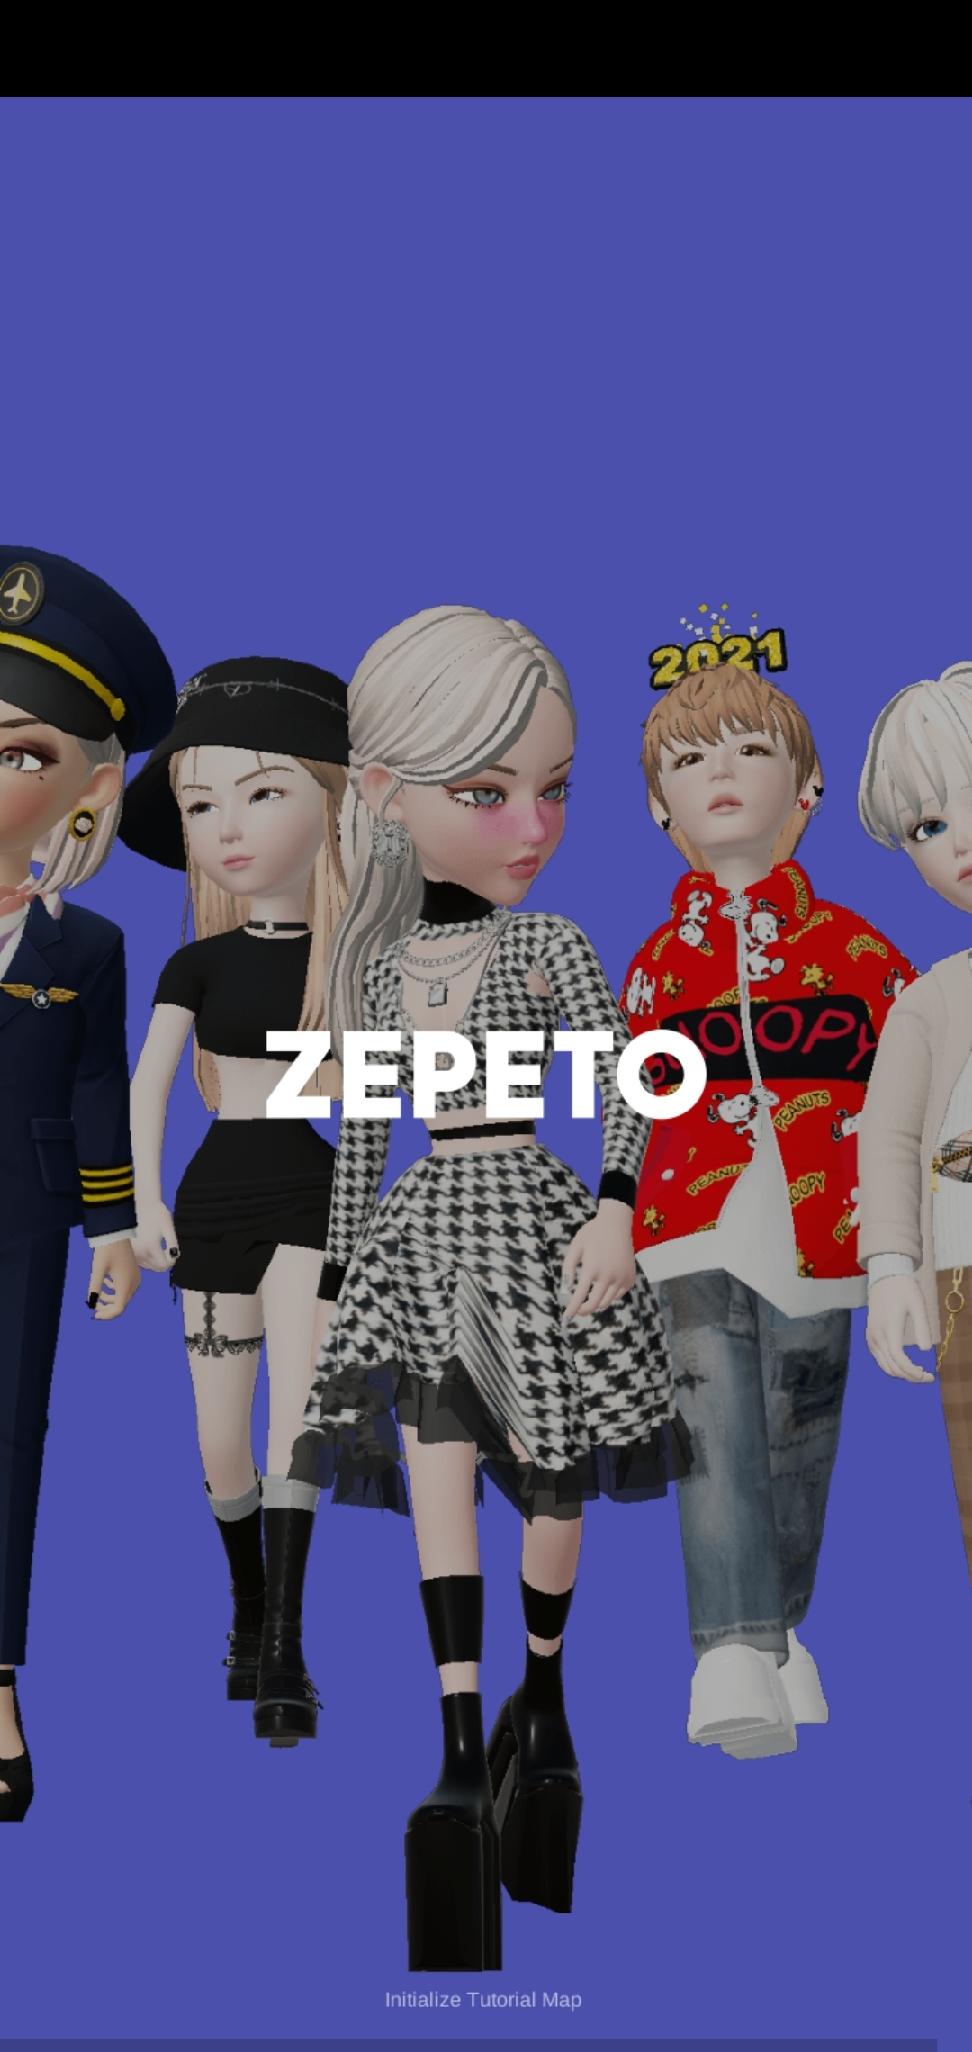 ZEPETO Mod apk download - Snow Corporation ZEPETO Mod Apk ...